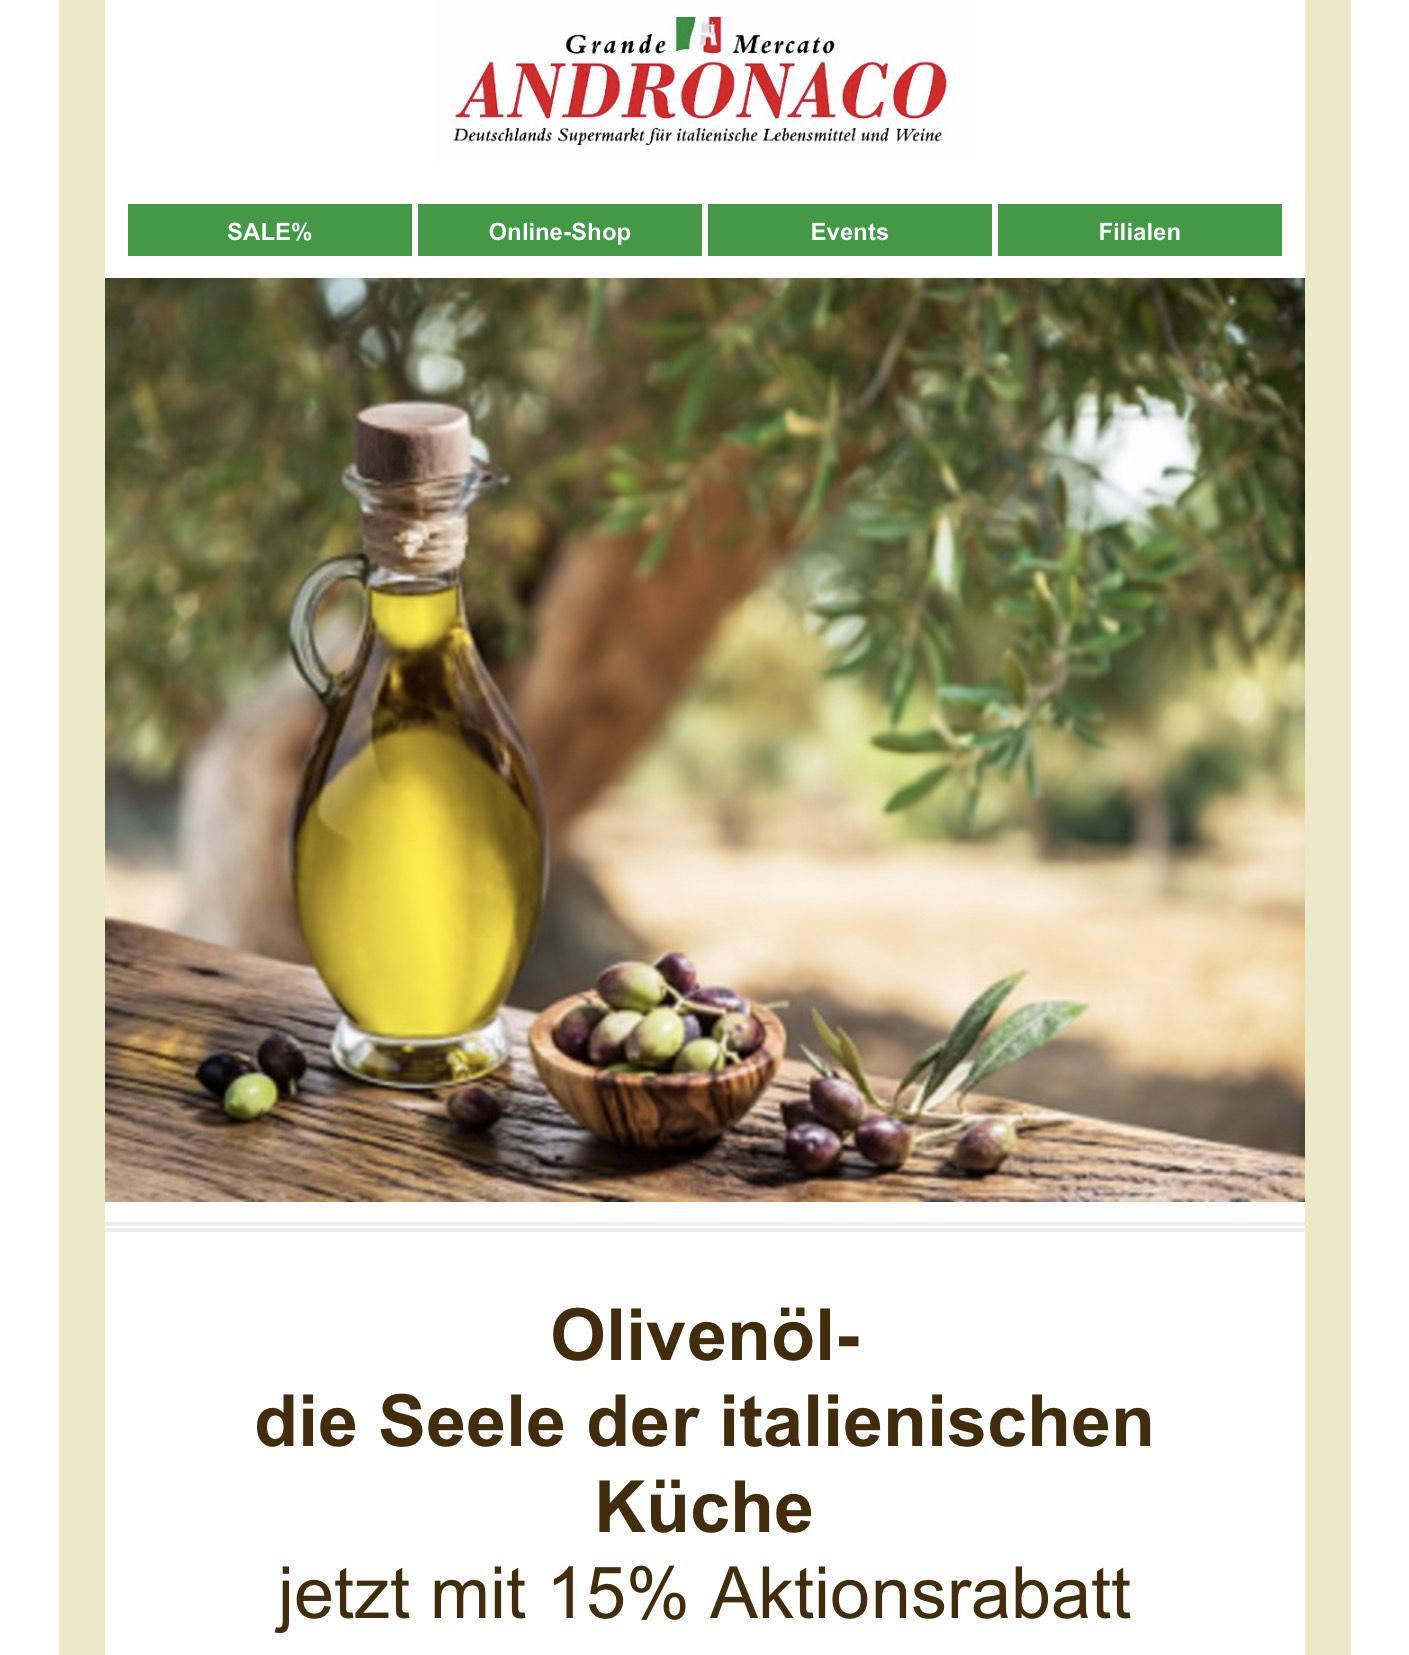 15% Rabatt auf Olivenöl + Balsamessig bei Grande Mercato ANDRONACO (online)